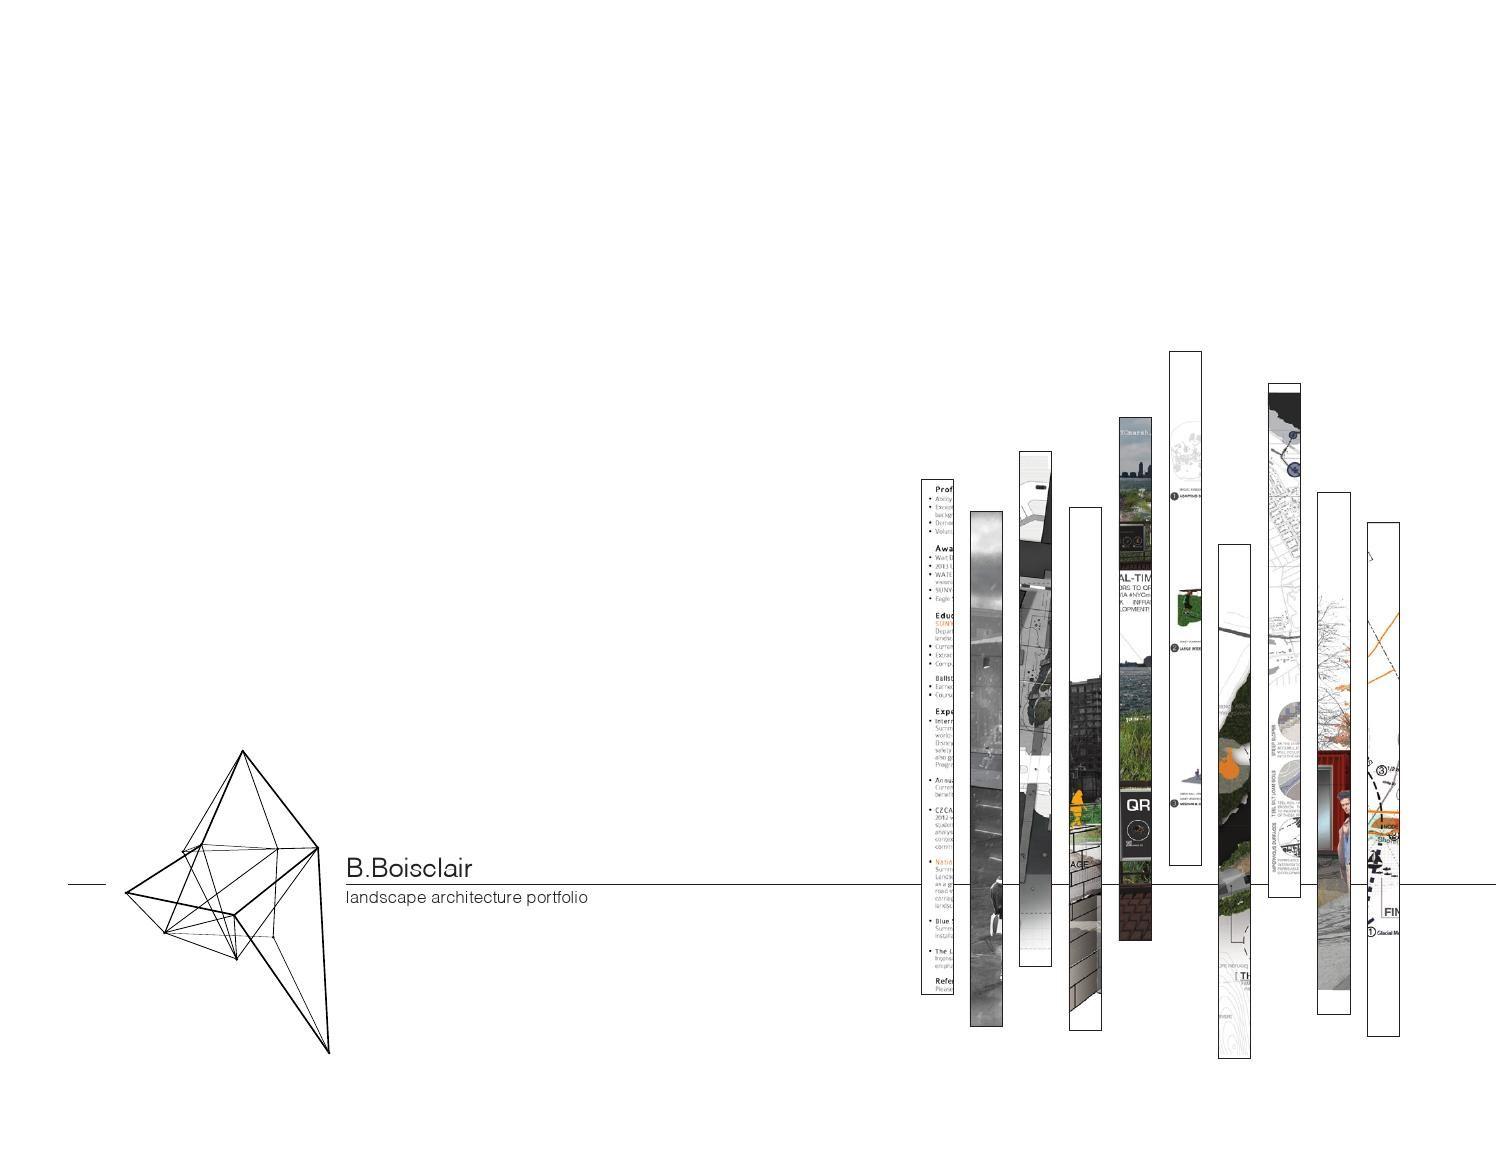 benjamin boisclair   landscape architecture